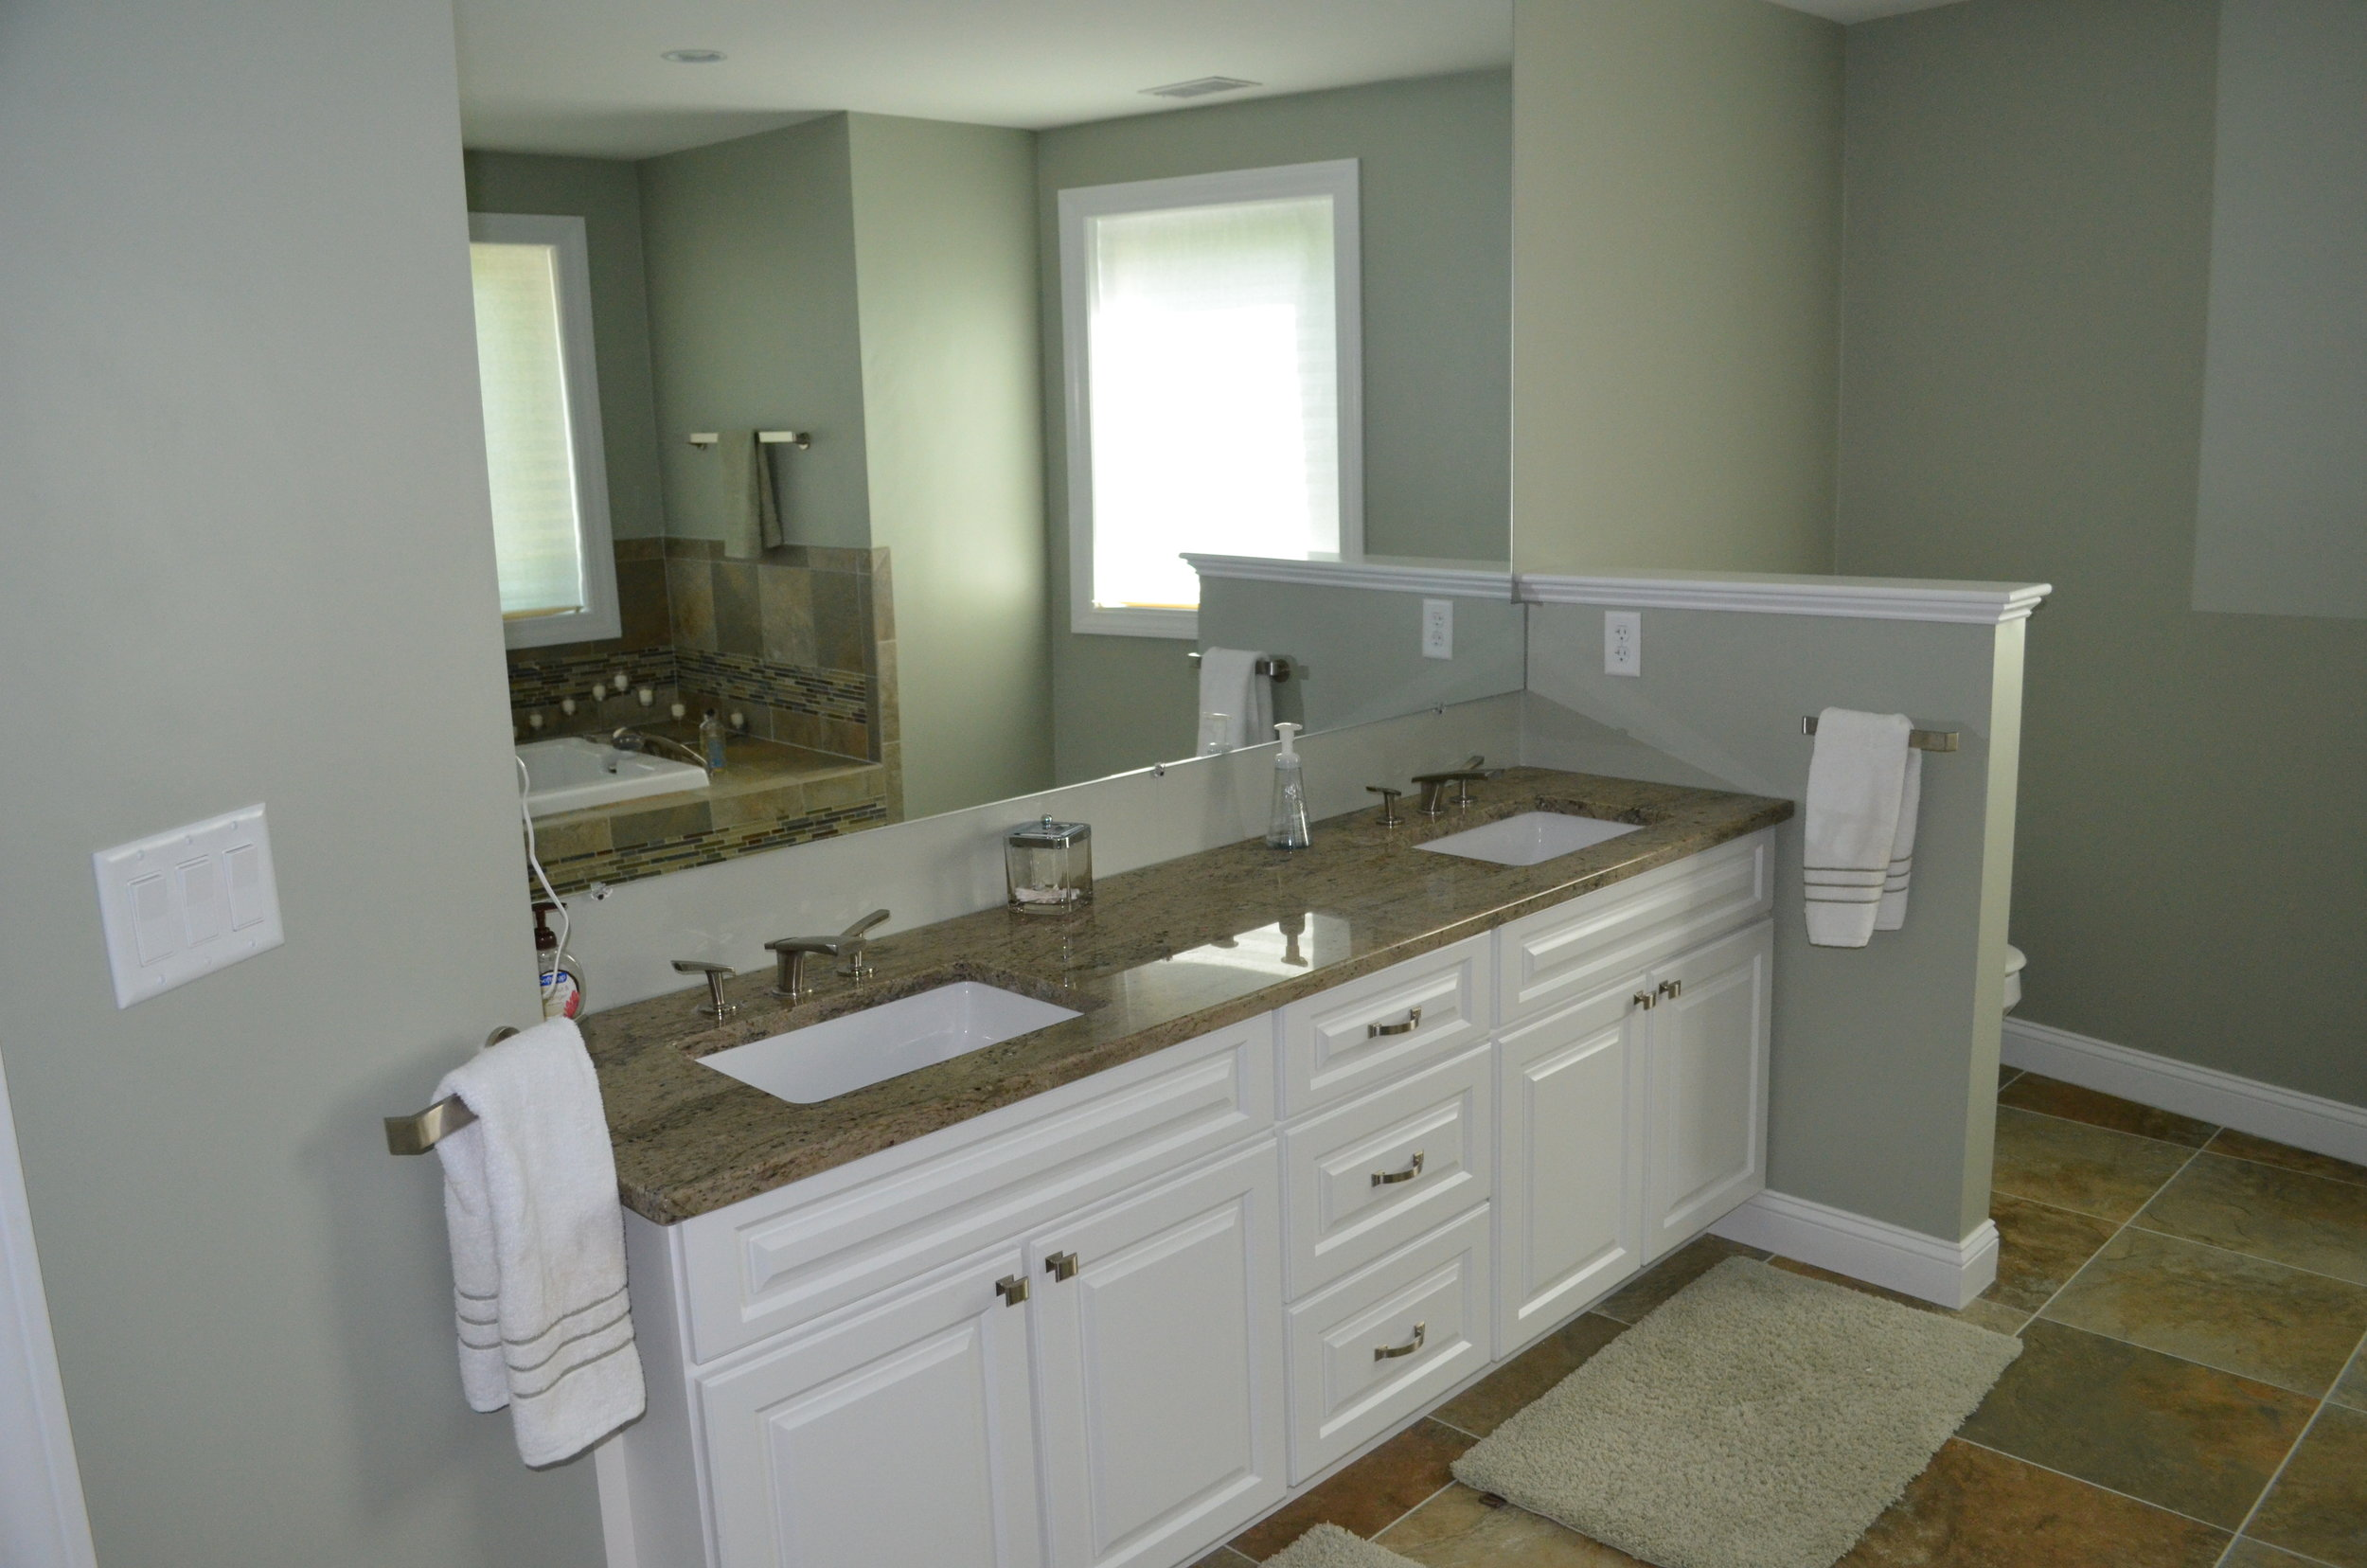 Home-Bathroom-Horizontal.JPG